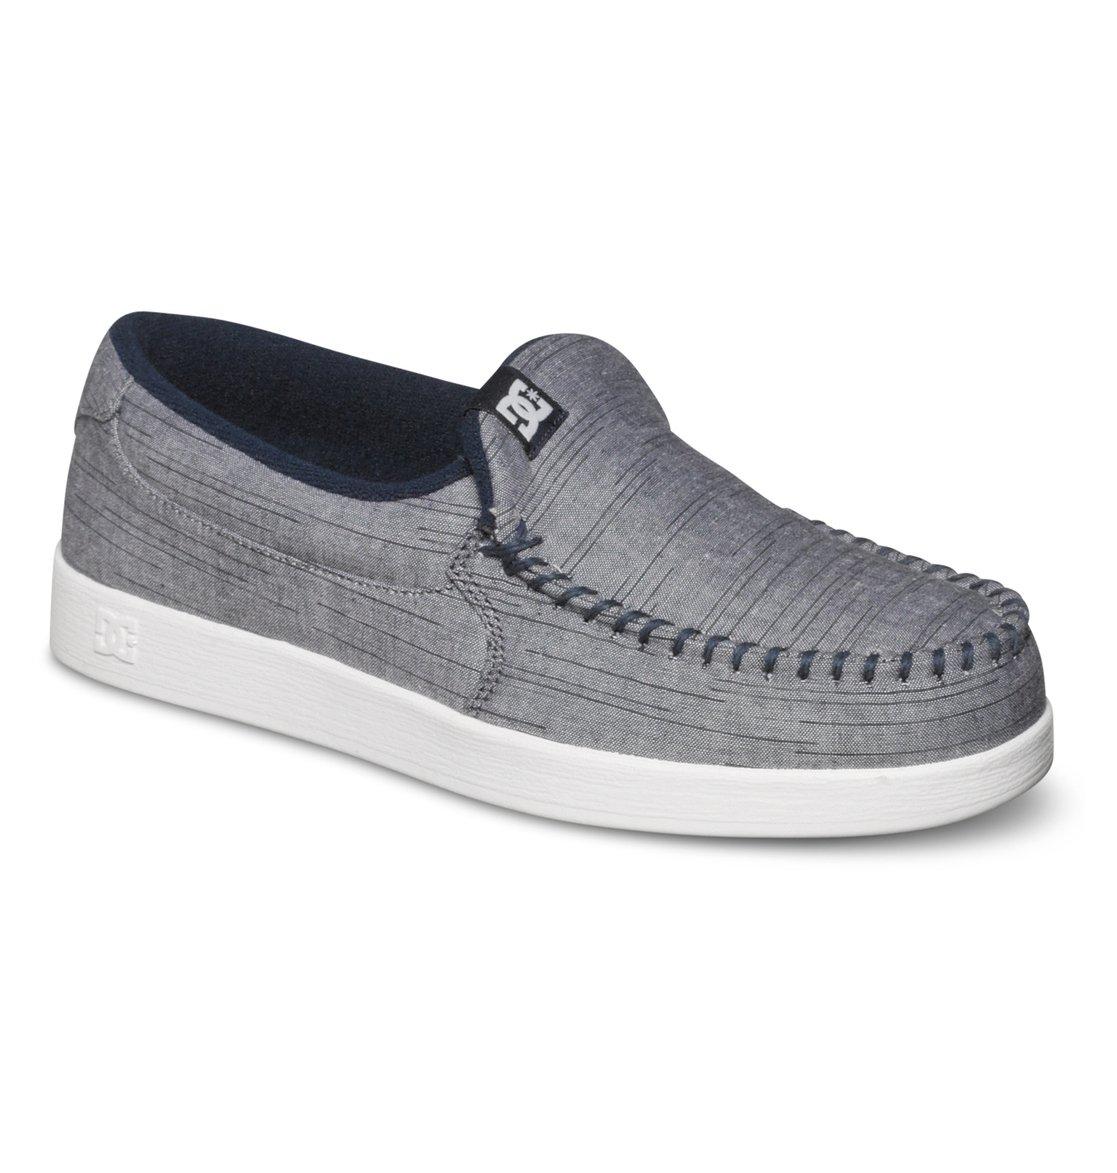 Dc Villain Slip On Shoes